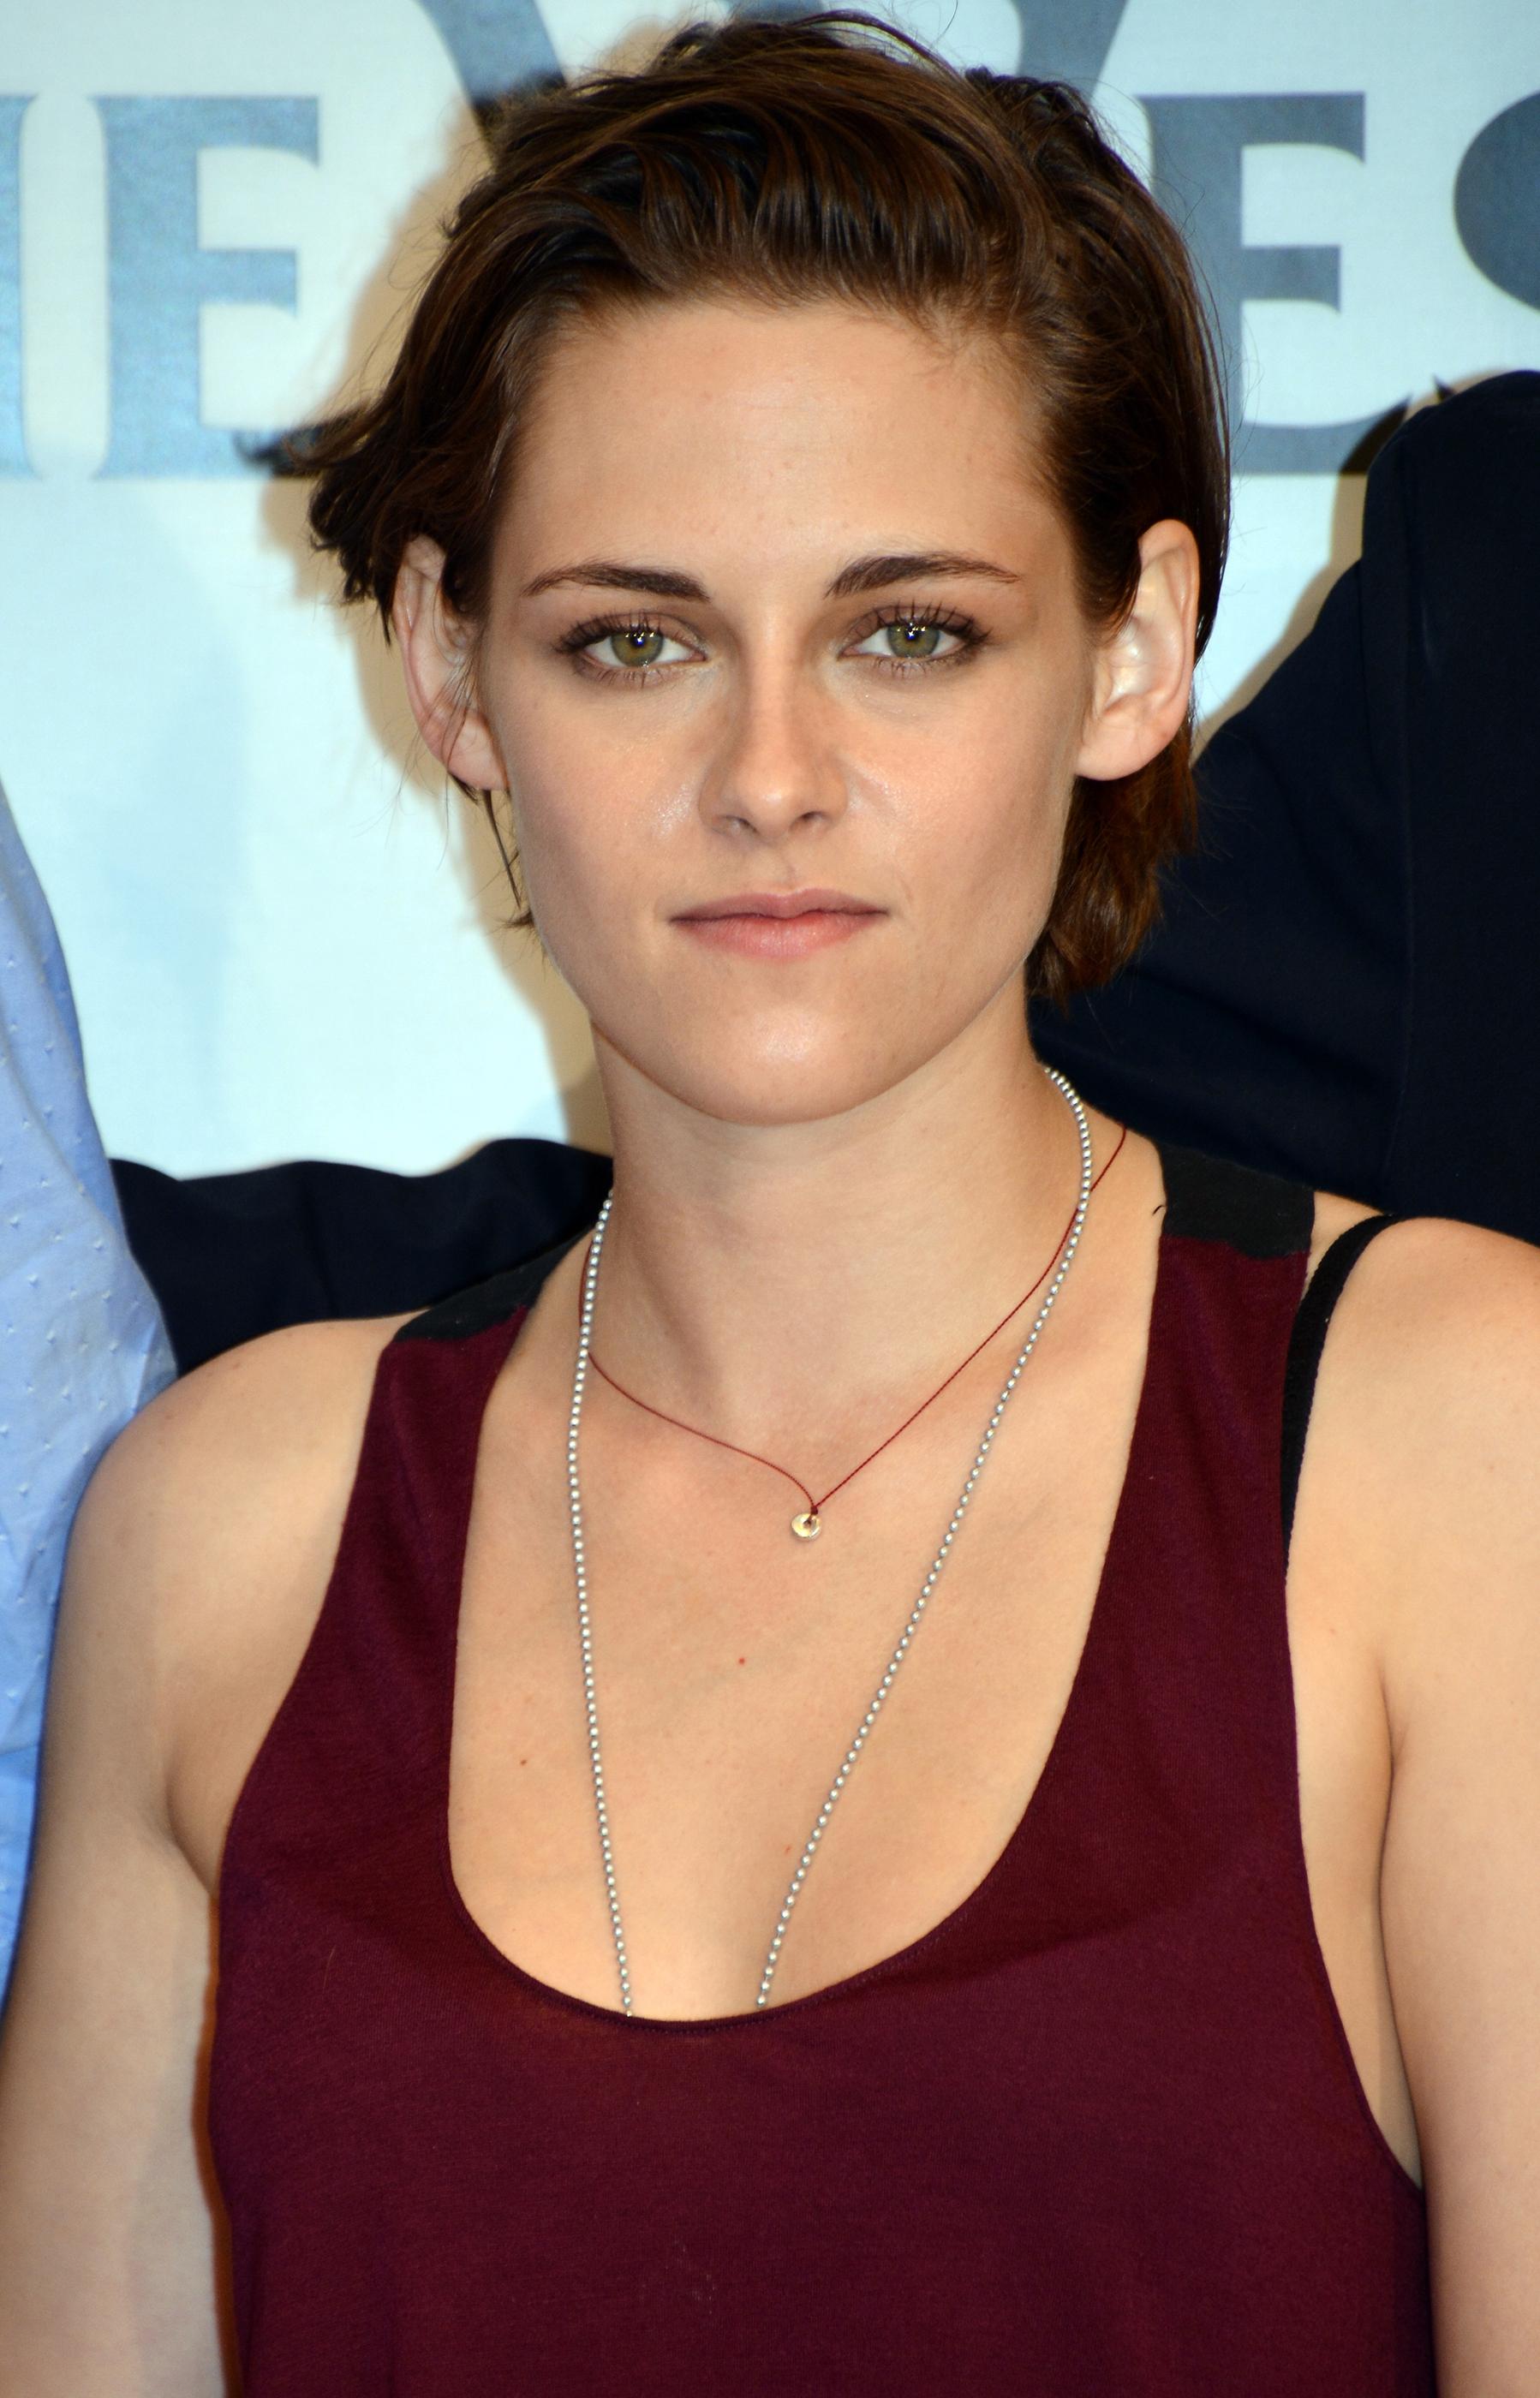 Kristen Stewart Has Brown Short Hair Stylecaster